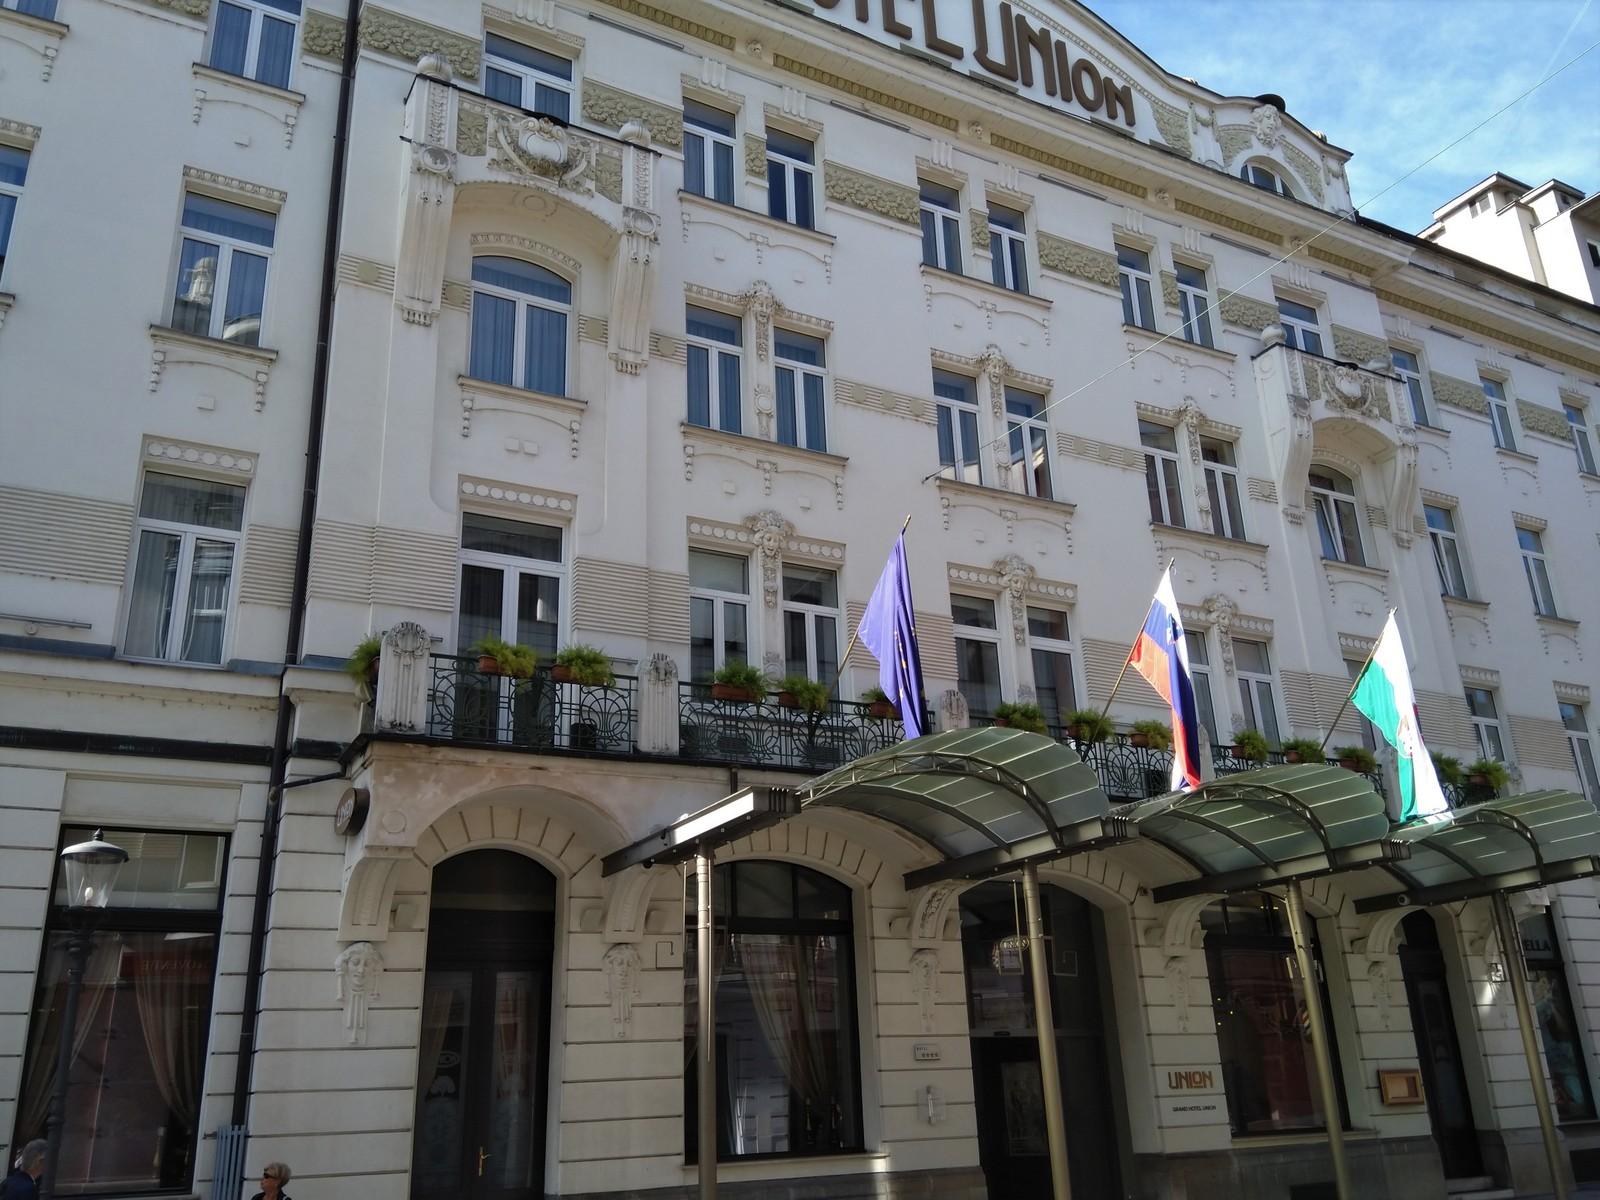 Ljubljana - Hotel Union